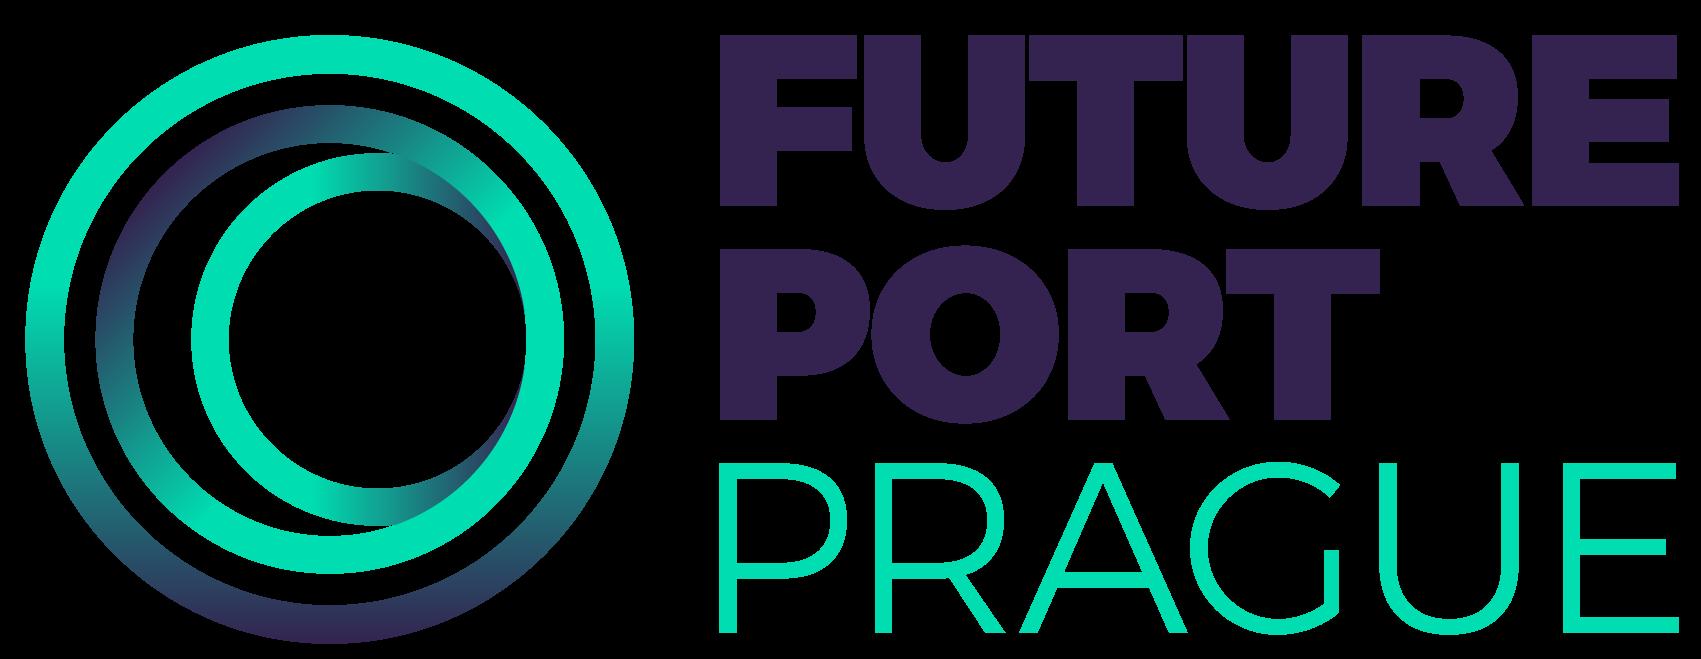 future-port-prague-logo-final-horizontal